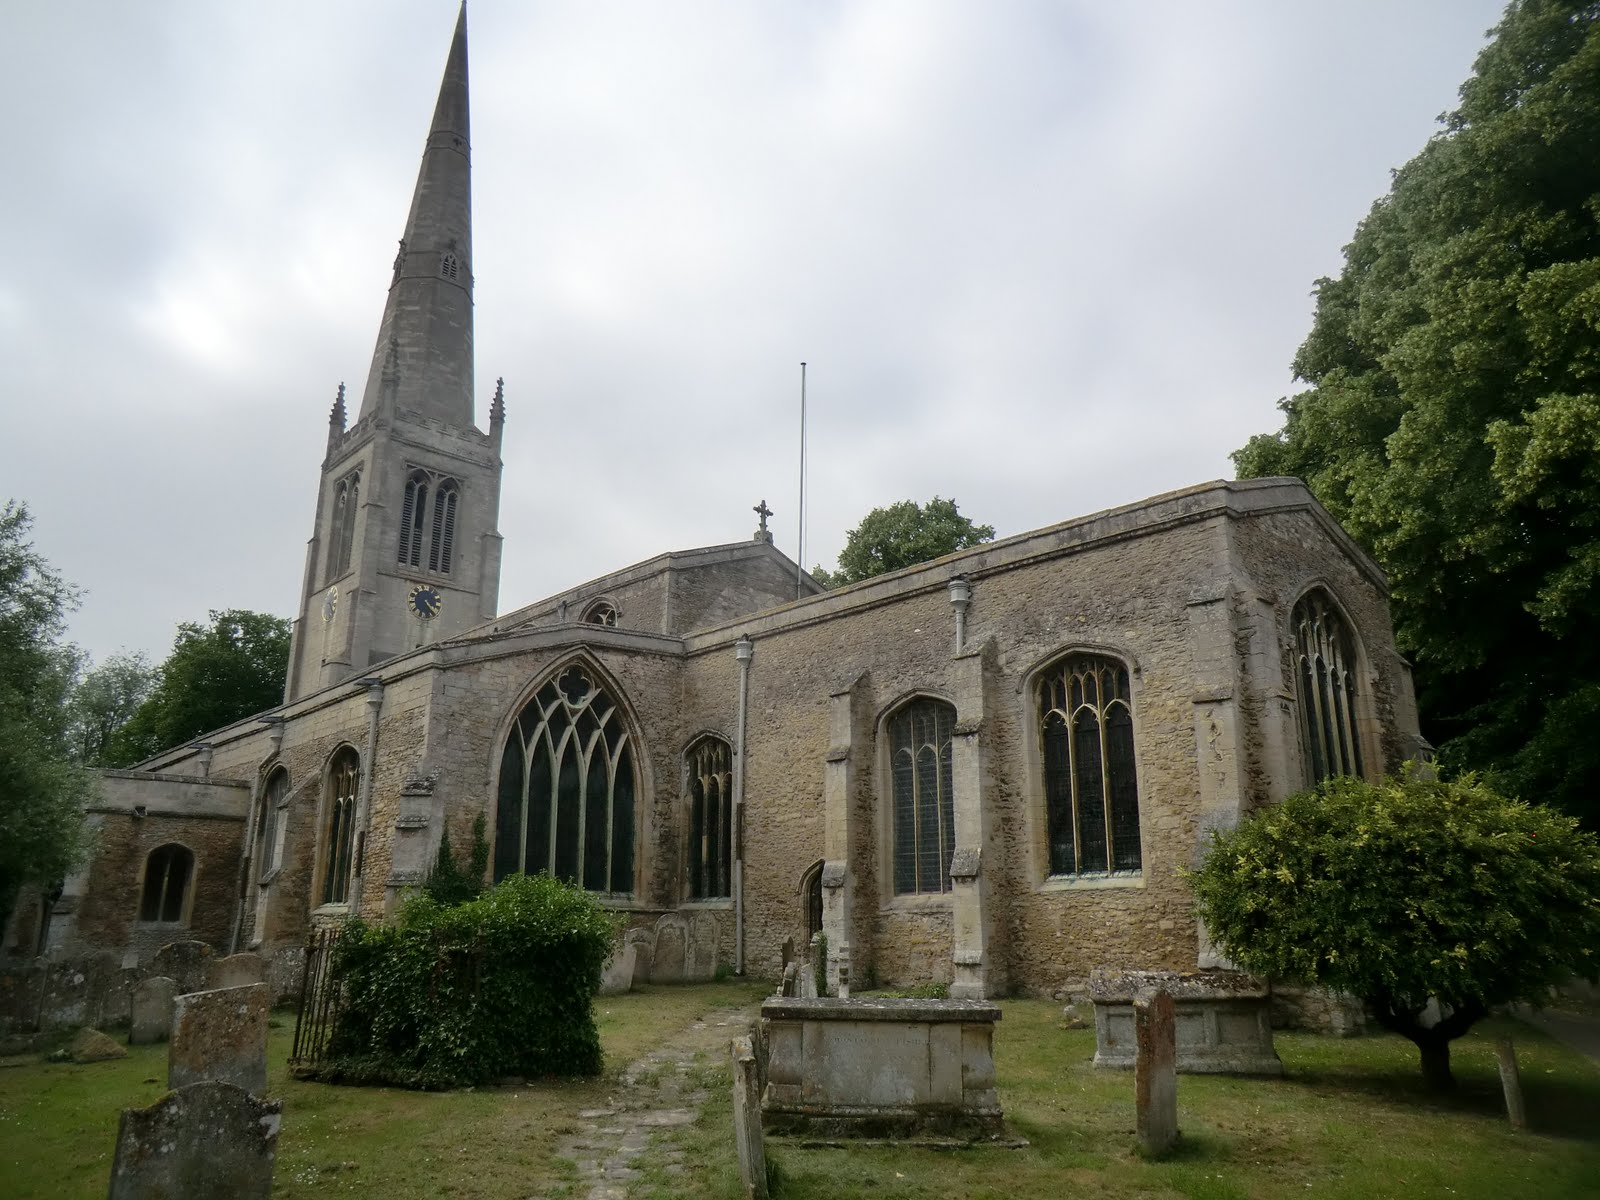 CIMG7875 All Saints church, St Ives